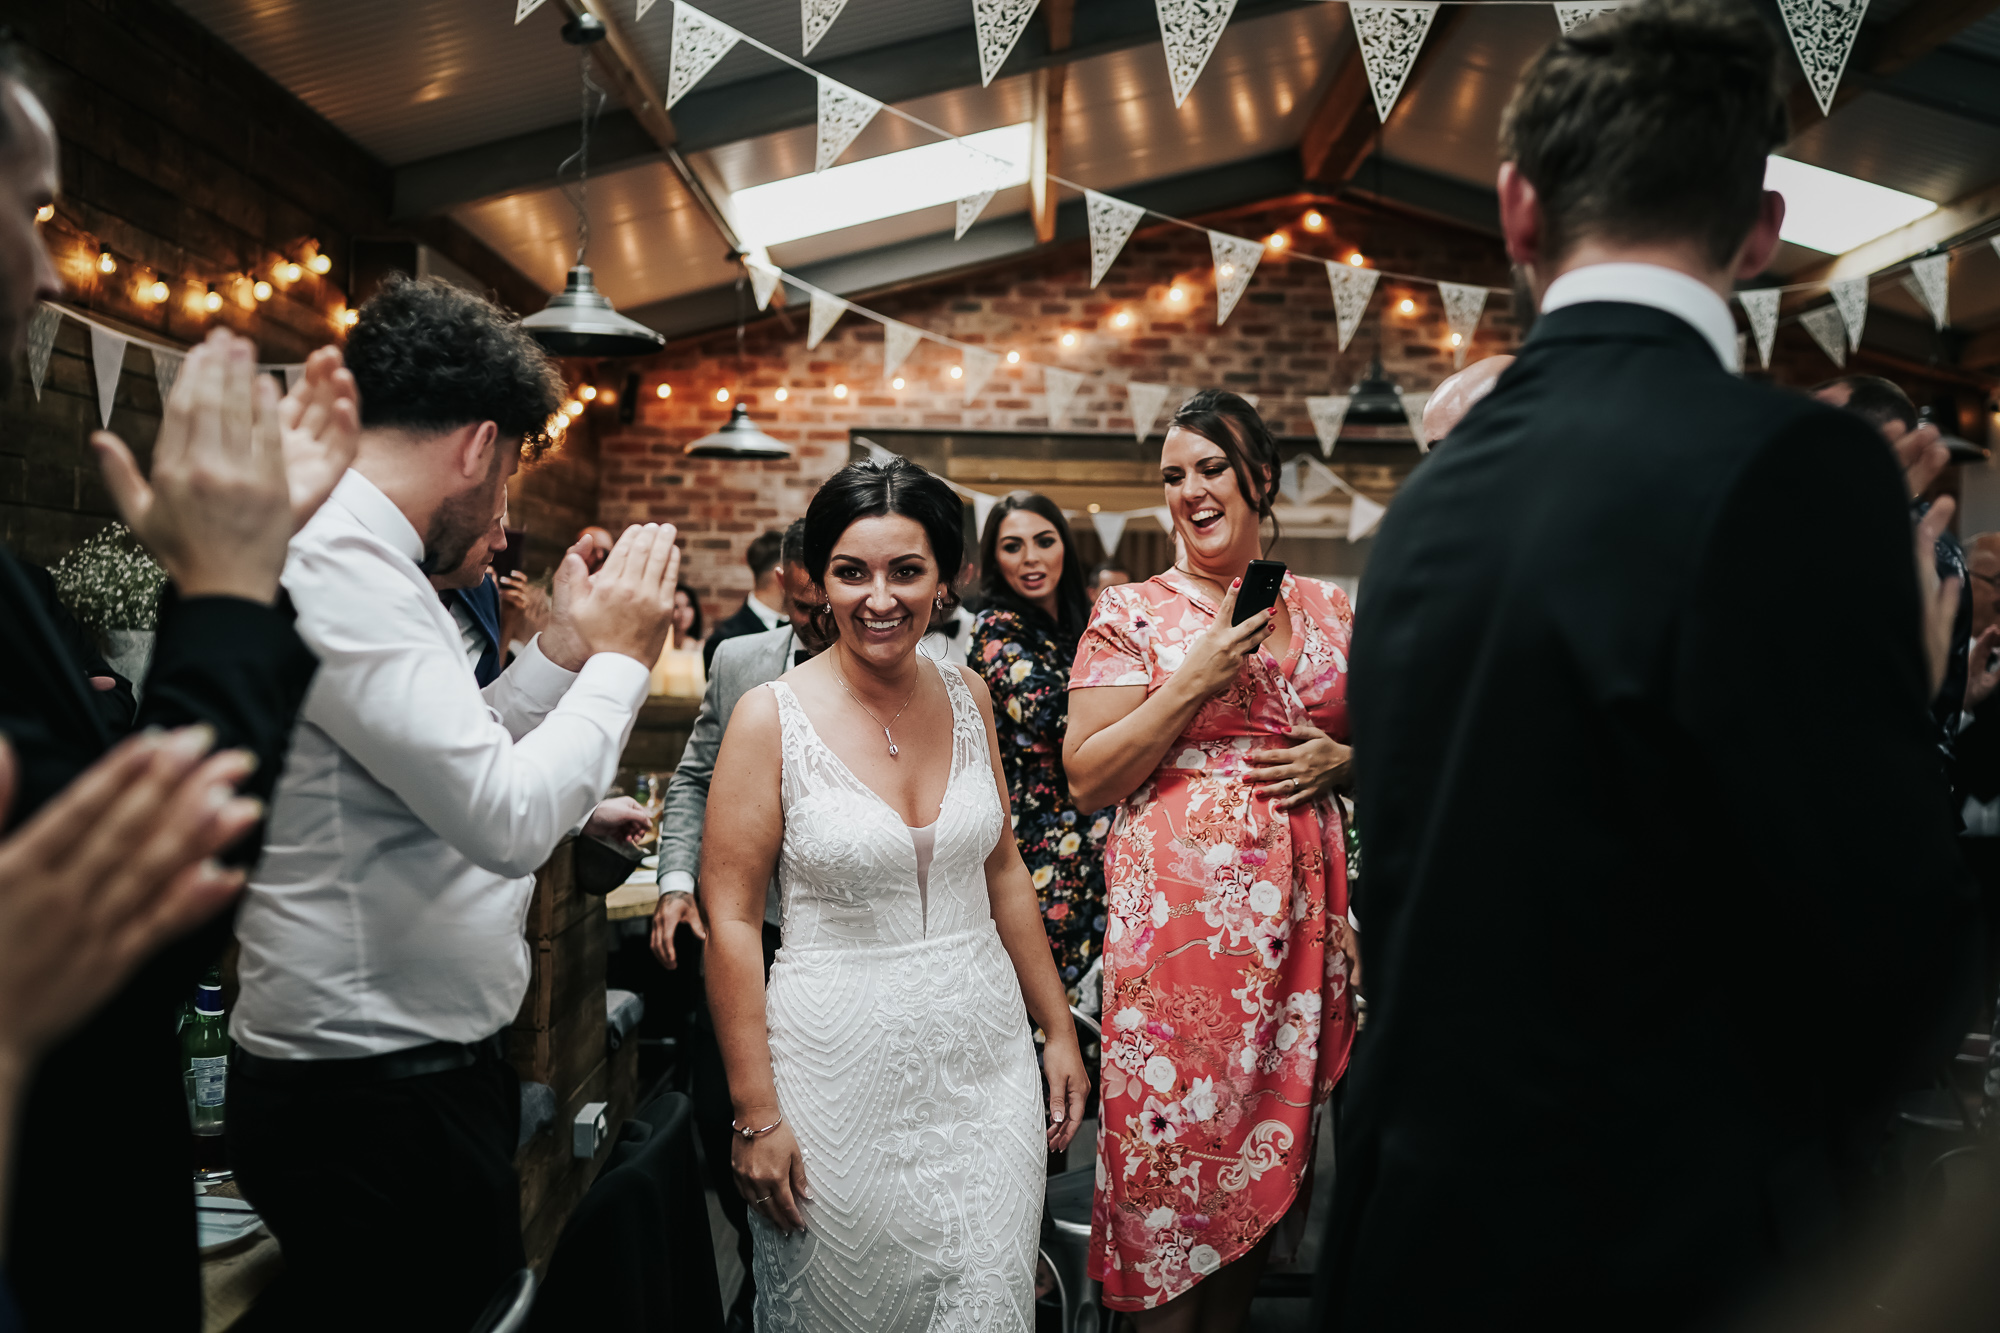 The Hayloft Wedding Photography Cheshire wedding photographer (40 of 52).jpg